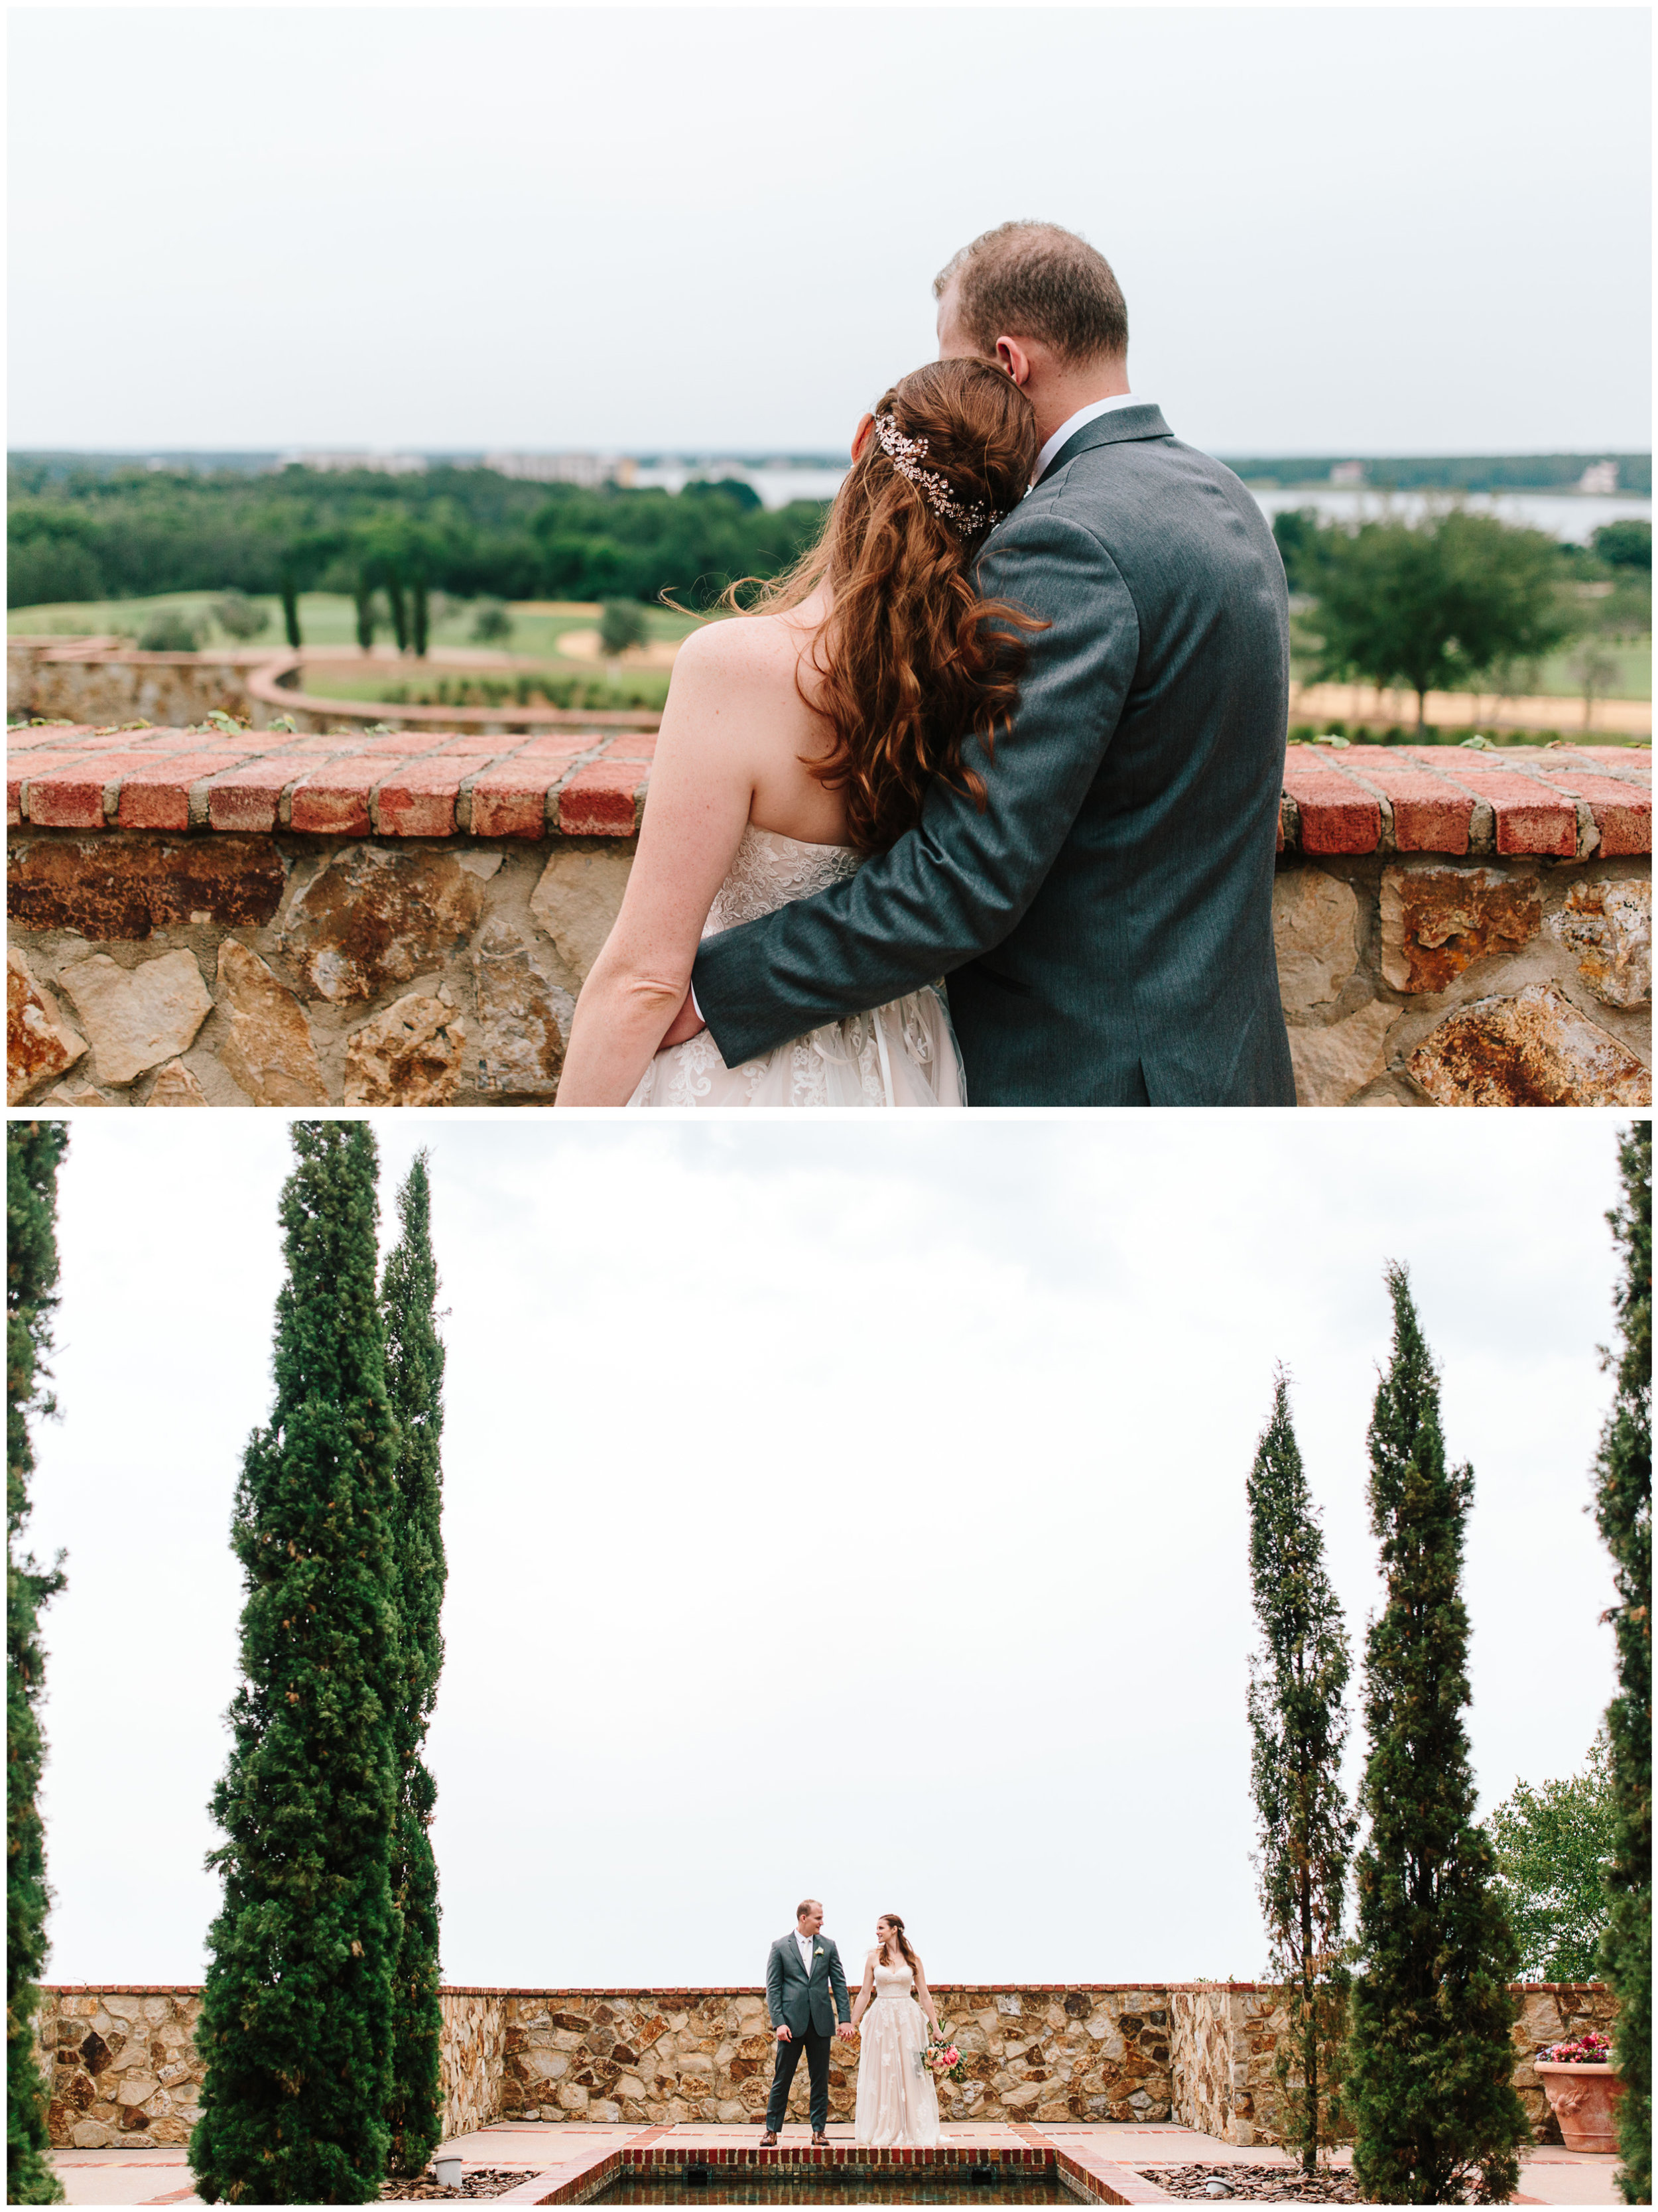 bella_collina_wedding_69.jpg